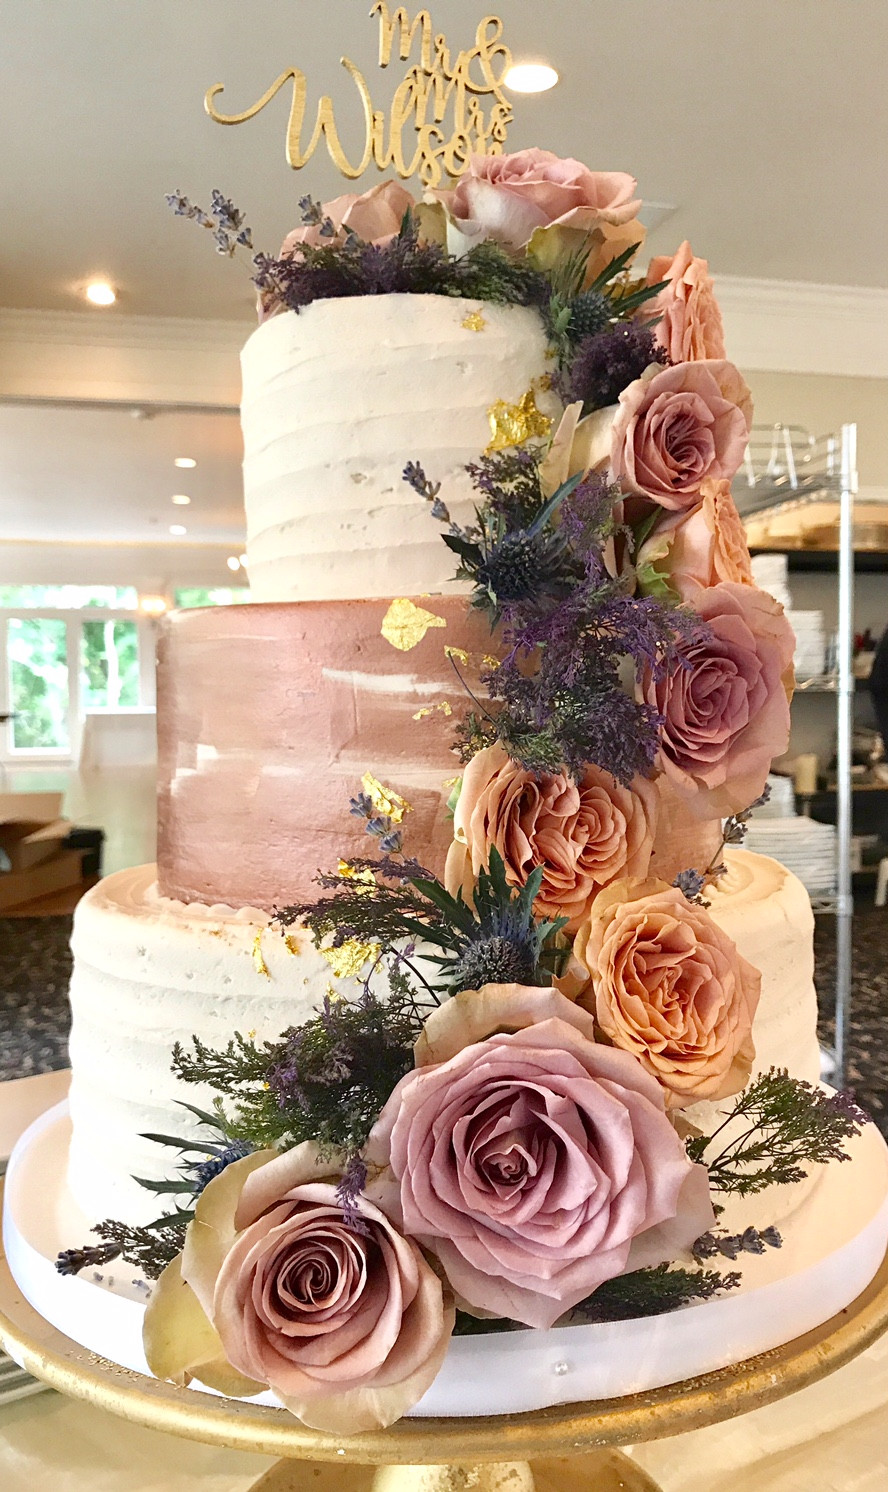 Custom Cakes Wedding Cakes Atlanta Wedding Gallery - Gold Wedding Cakes